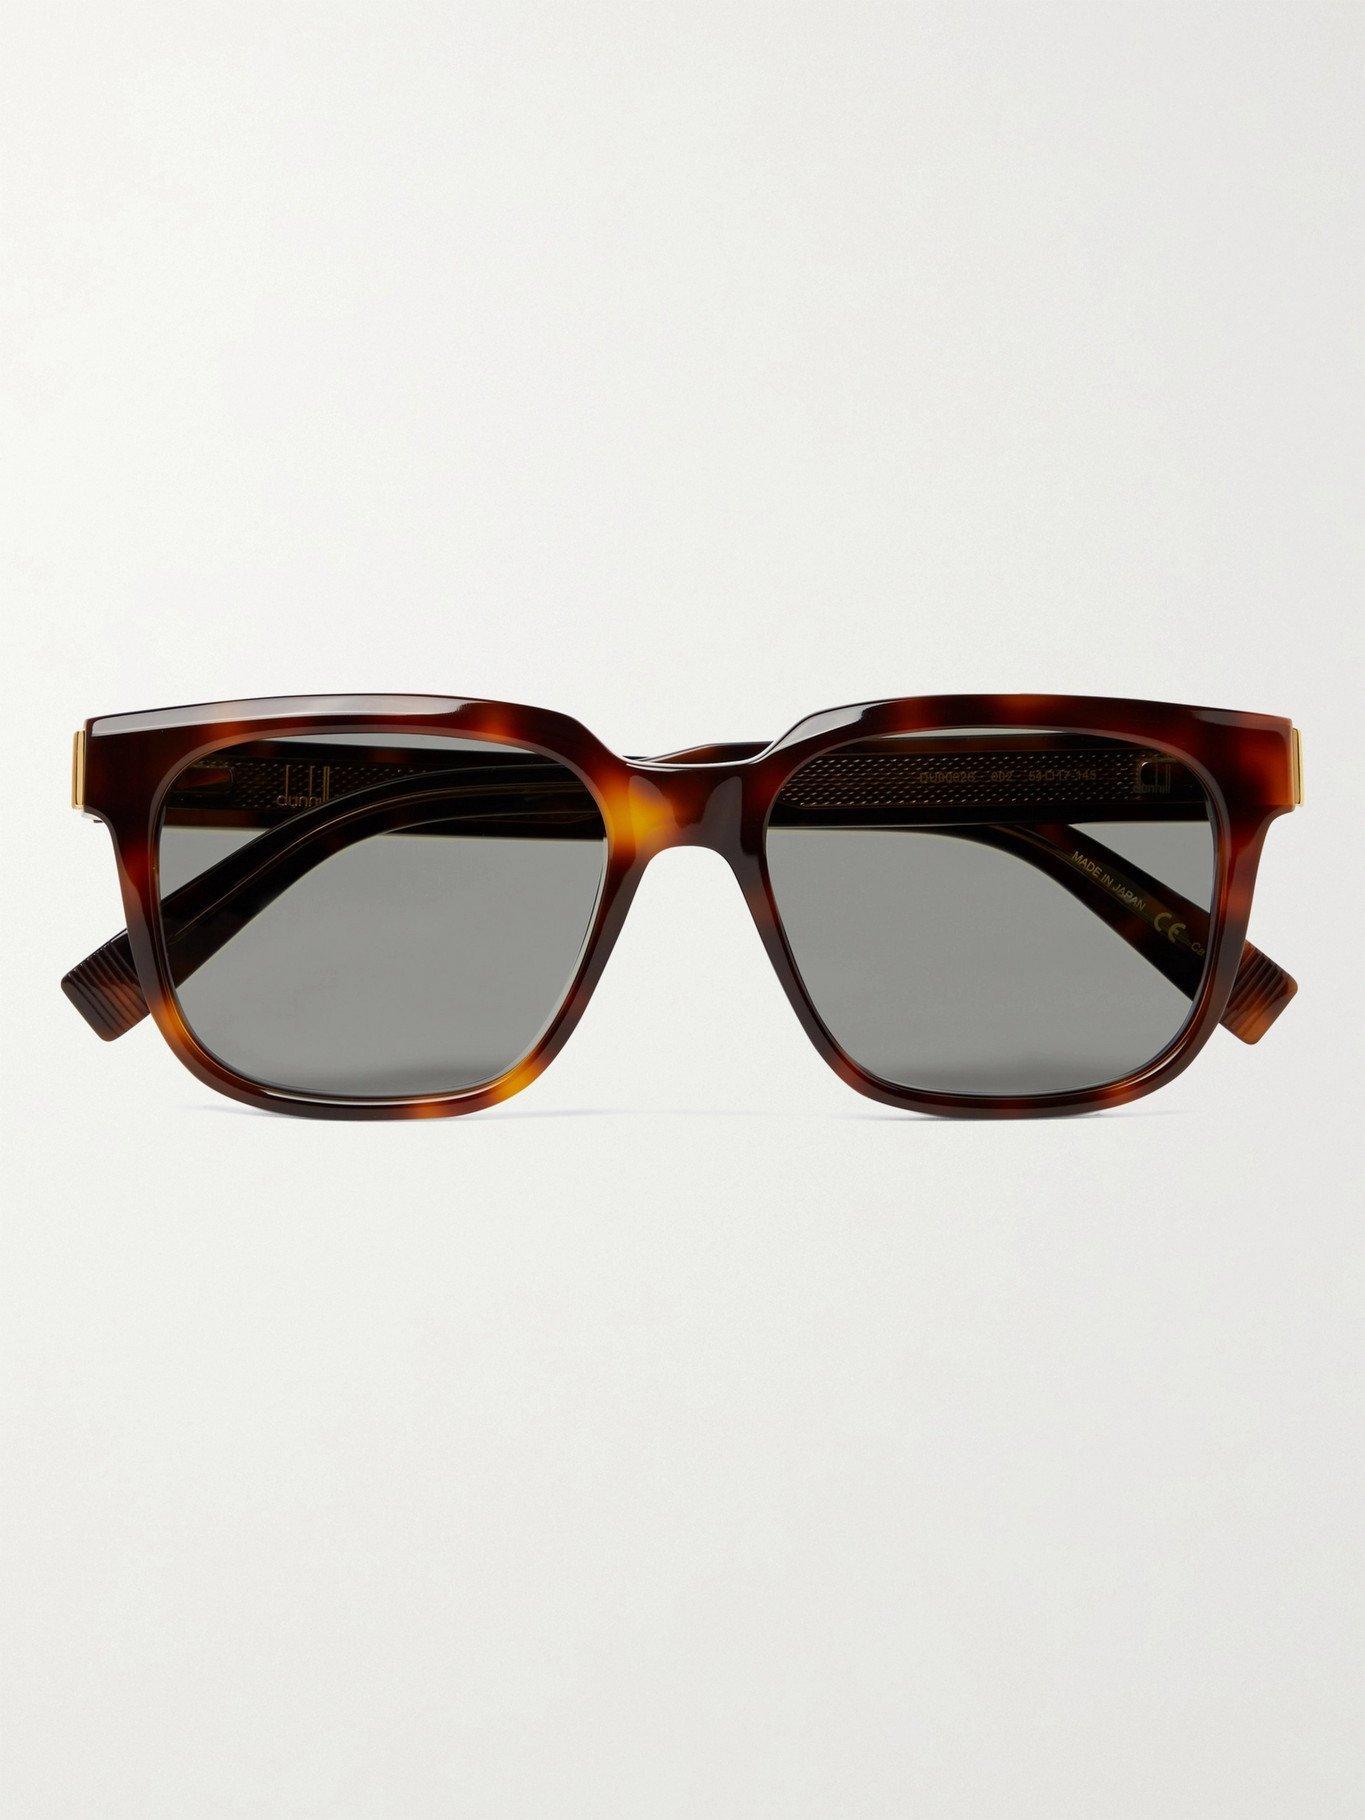 DUNHILL - Square-Frame Tortoiseshell Acetate Sunglasses - Tortoiseshell